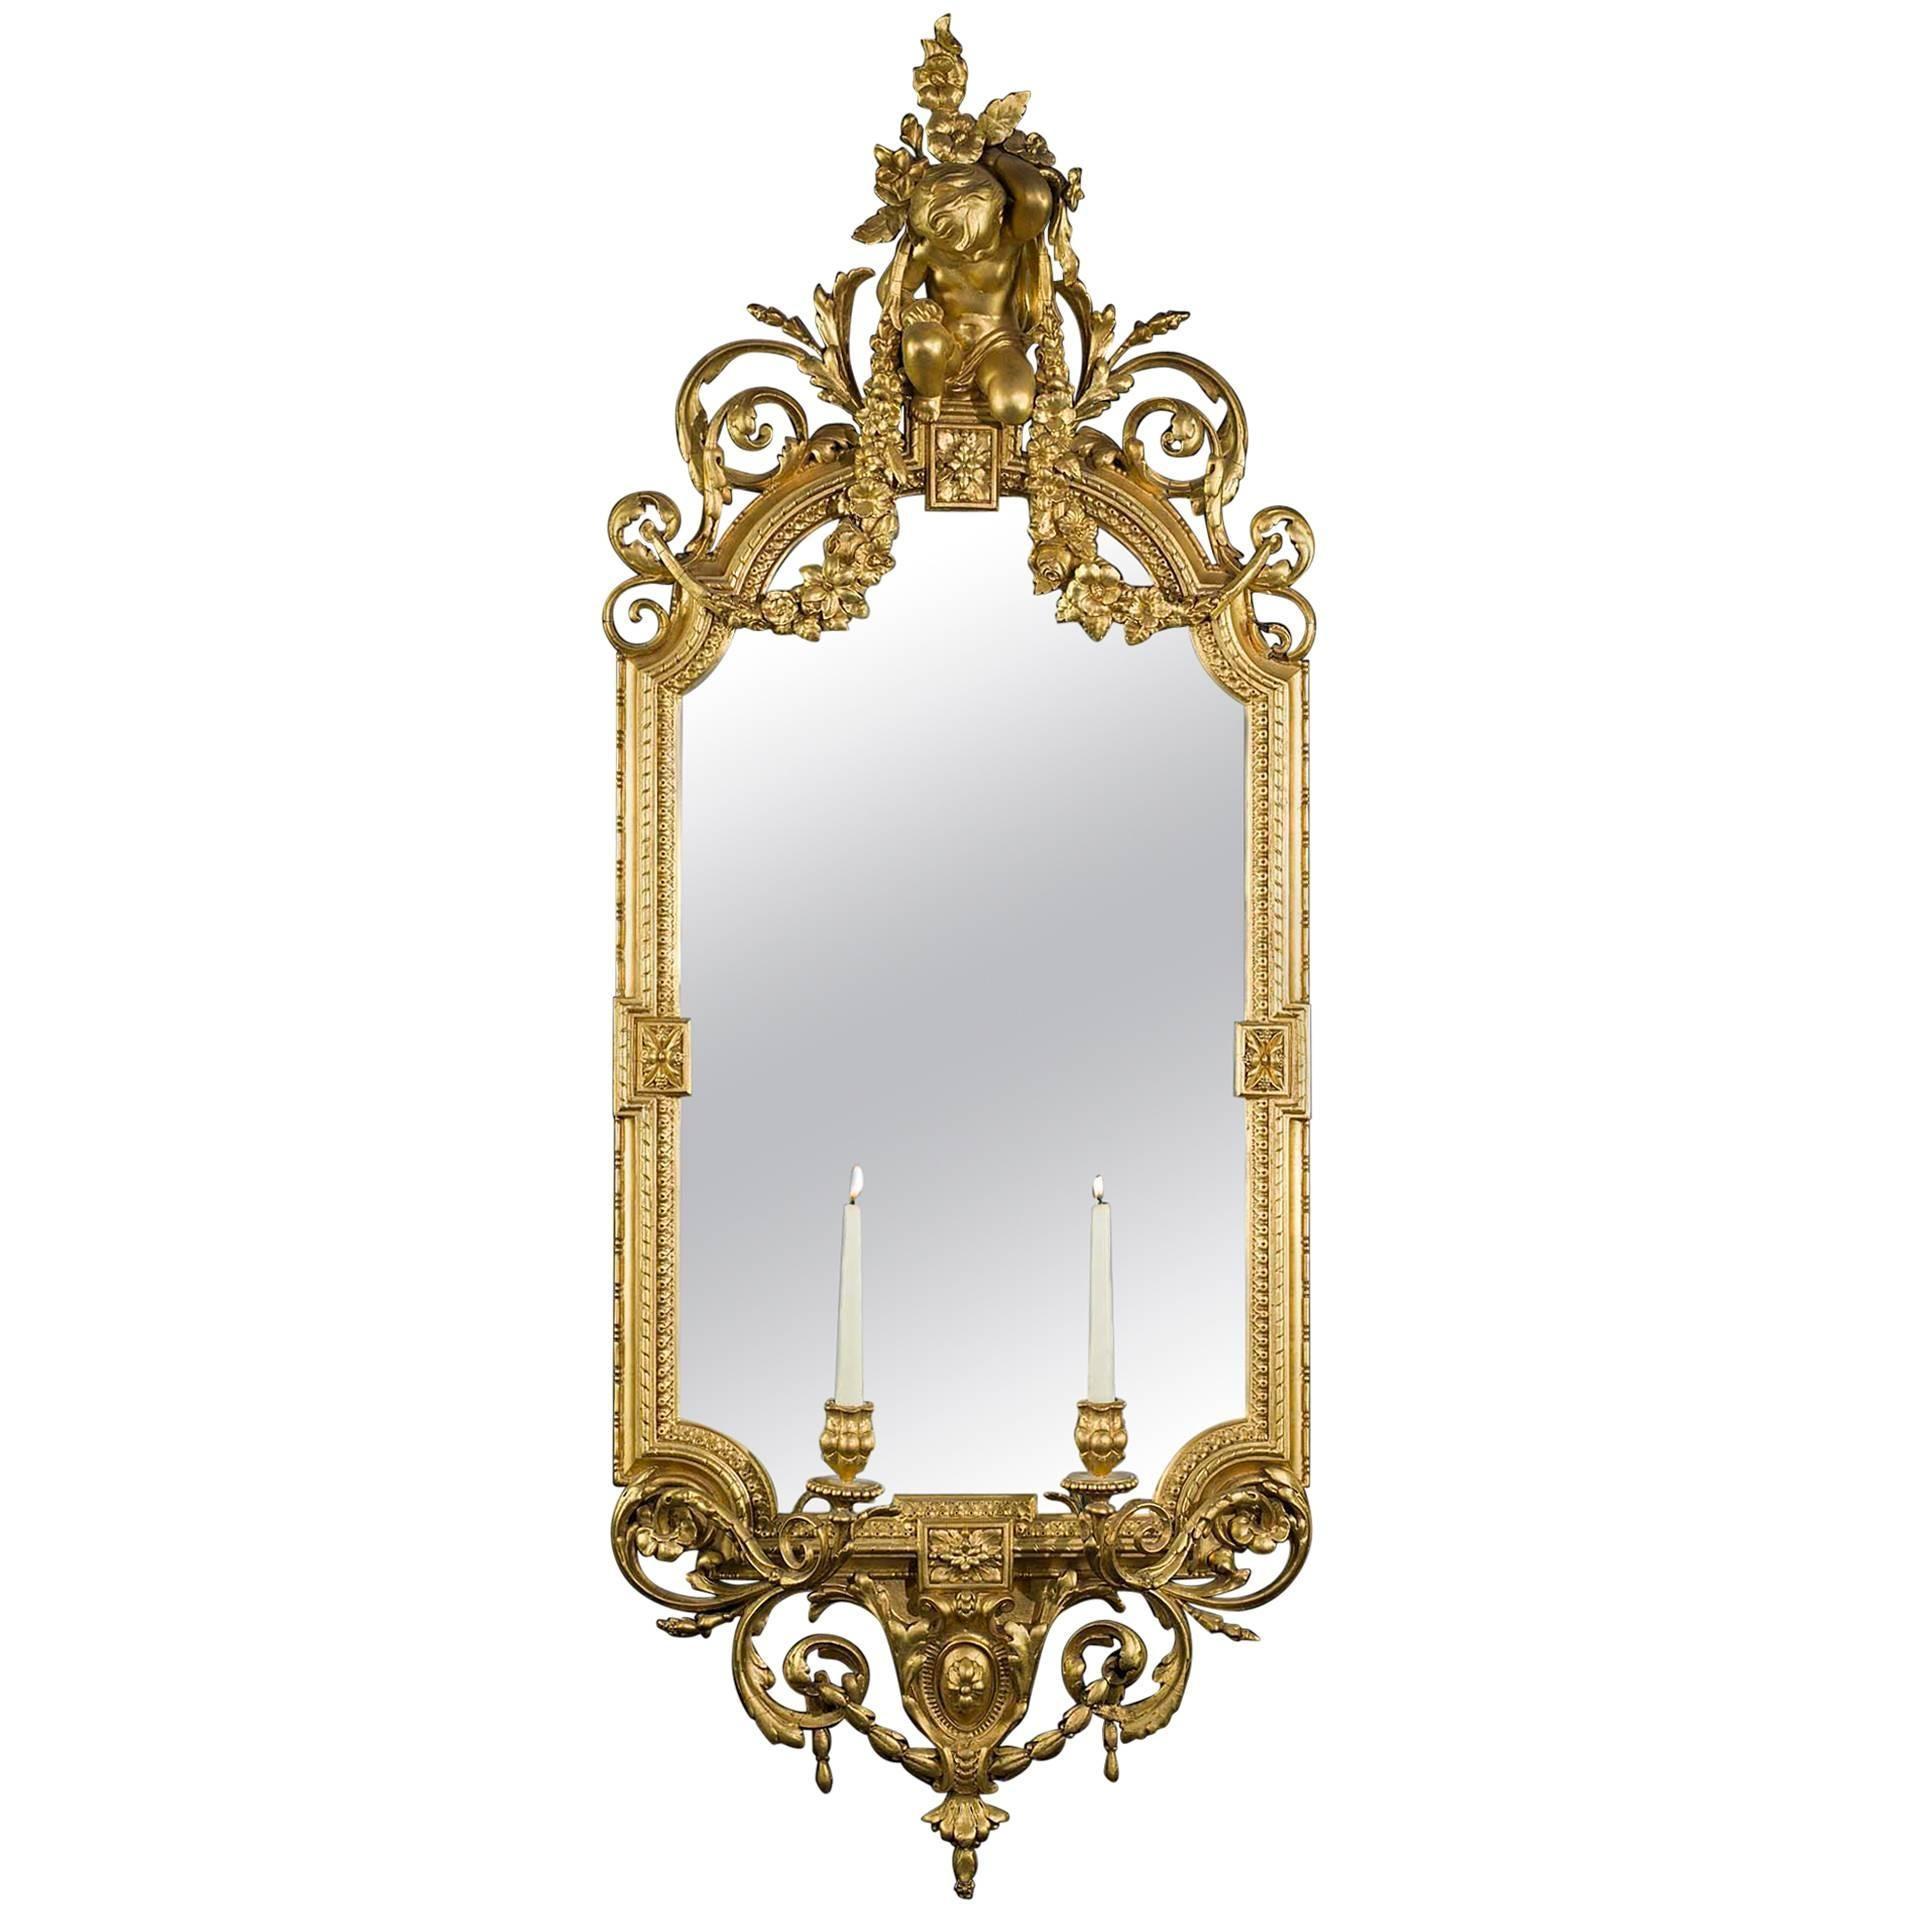 Antique Giltwood and Gesso Louis XV Style Girandole Mirror